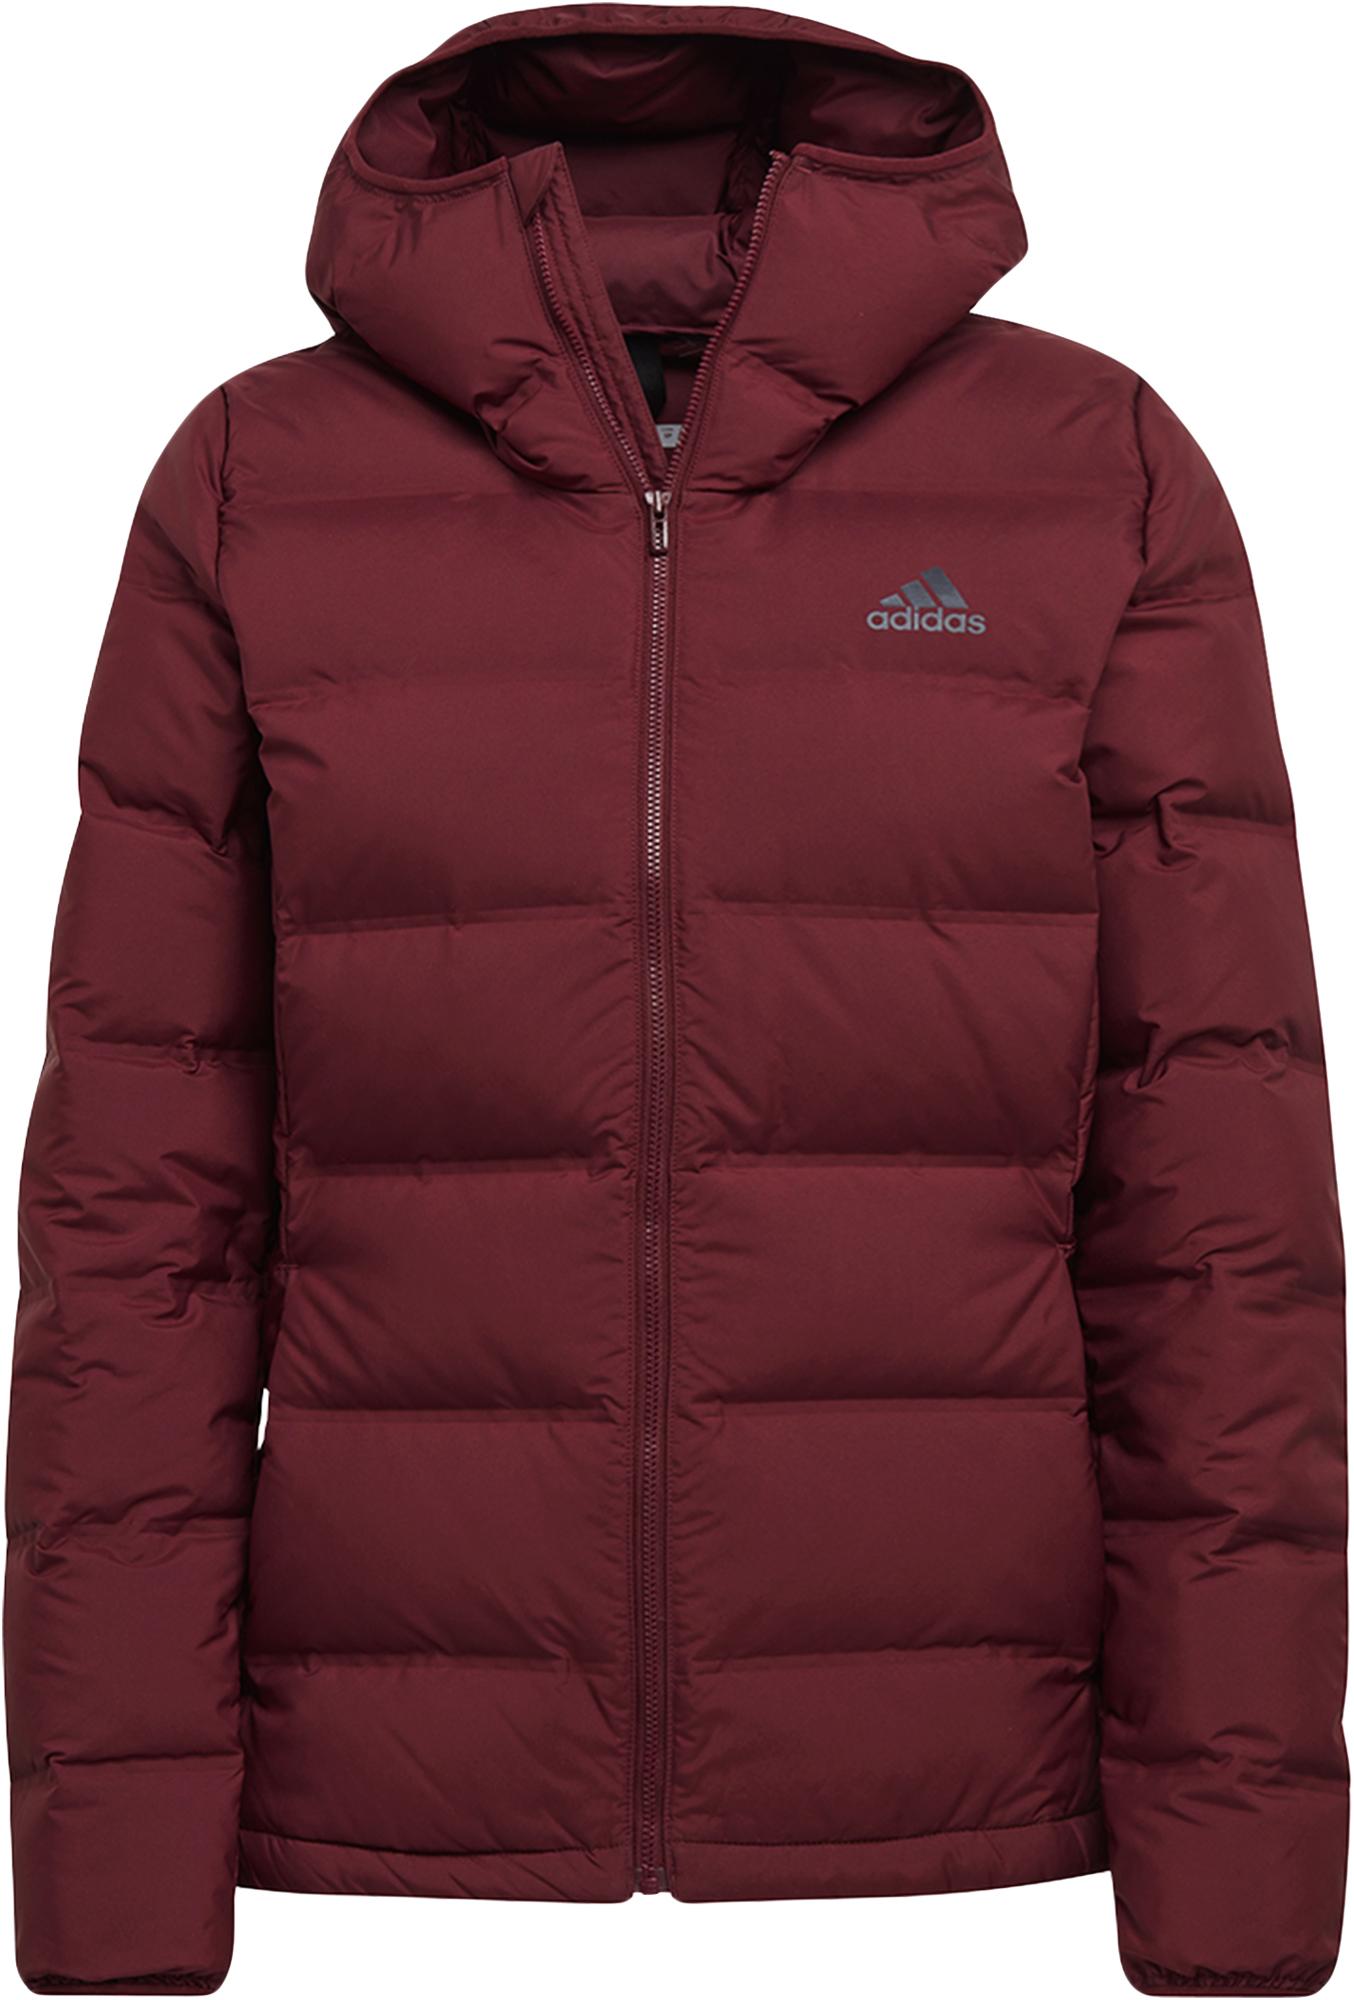 Adidas Куртка пуховая женская Helionic Hooded, размер 52-54